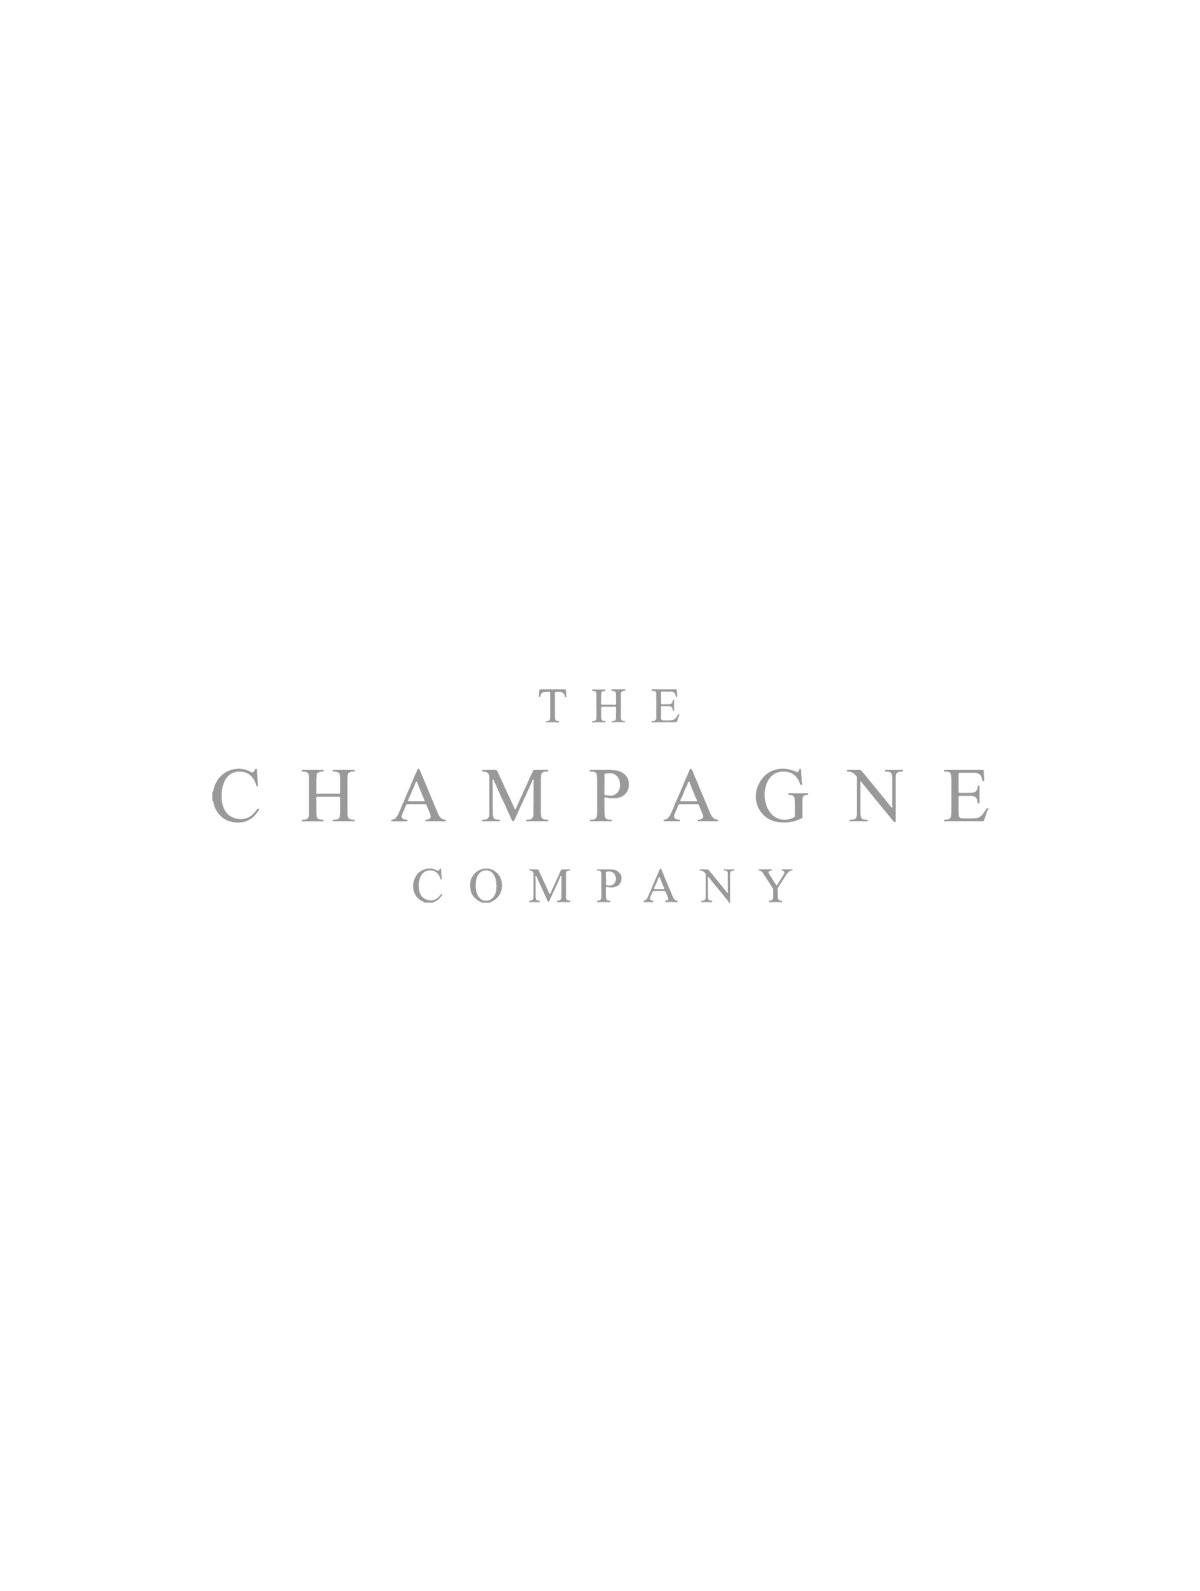 Dom Perignon Rose 1995 Plenitude P2 Vintage Champagne 75cl Gift Boxed